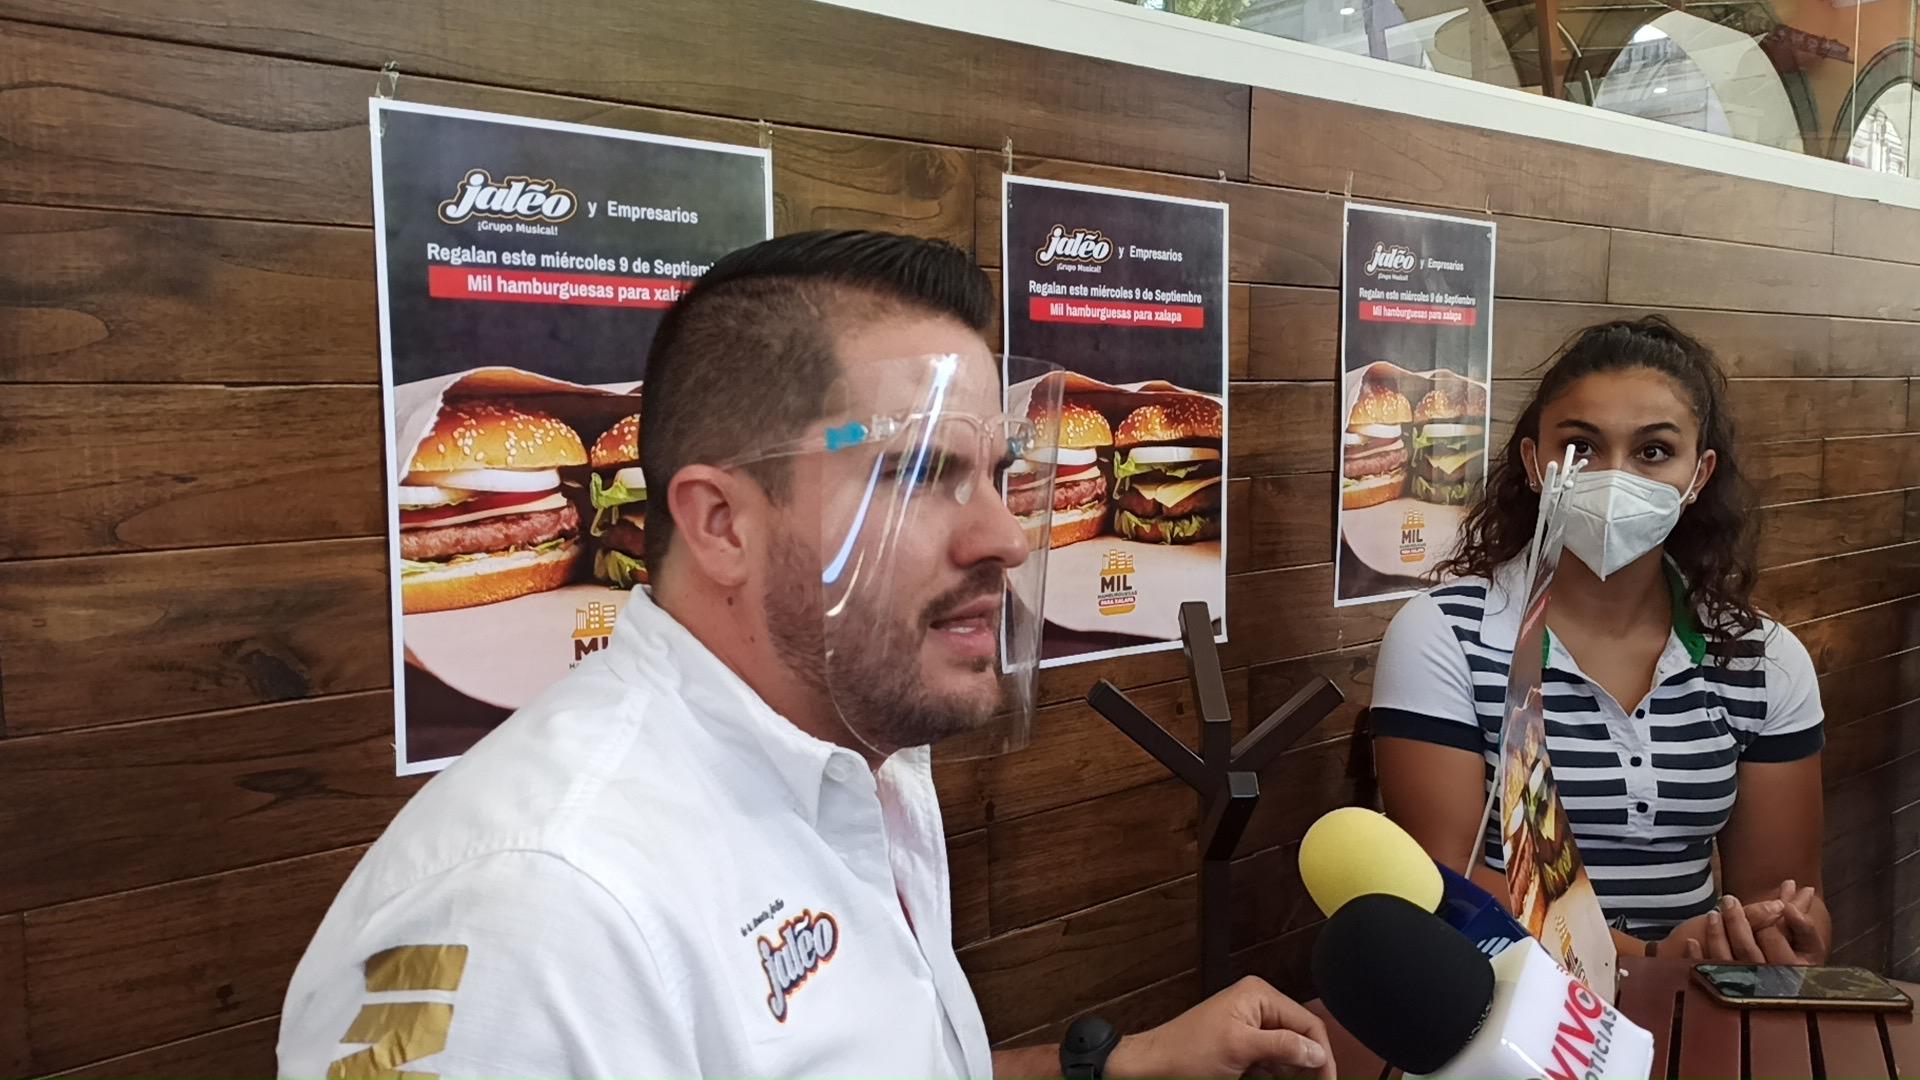 Este miércoles repartirán mil hamburguesas en Xalapa